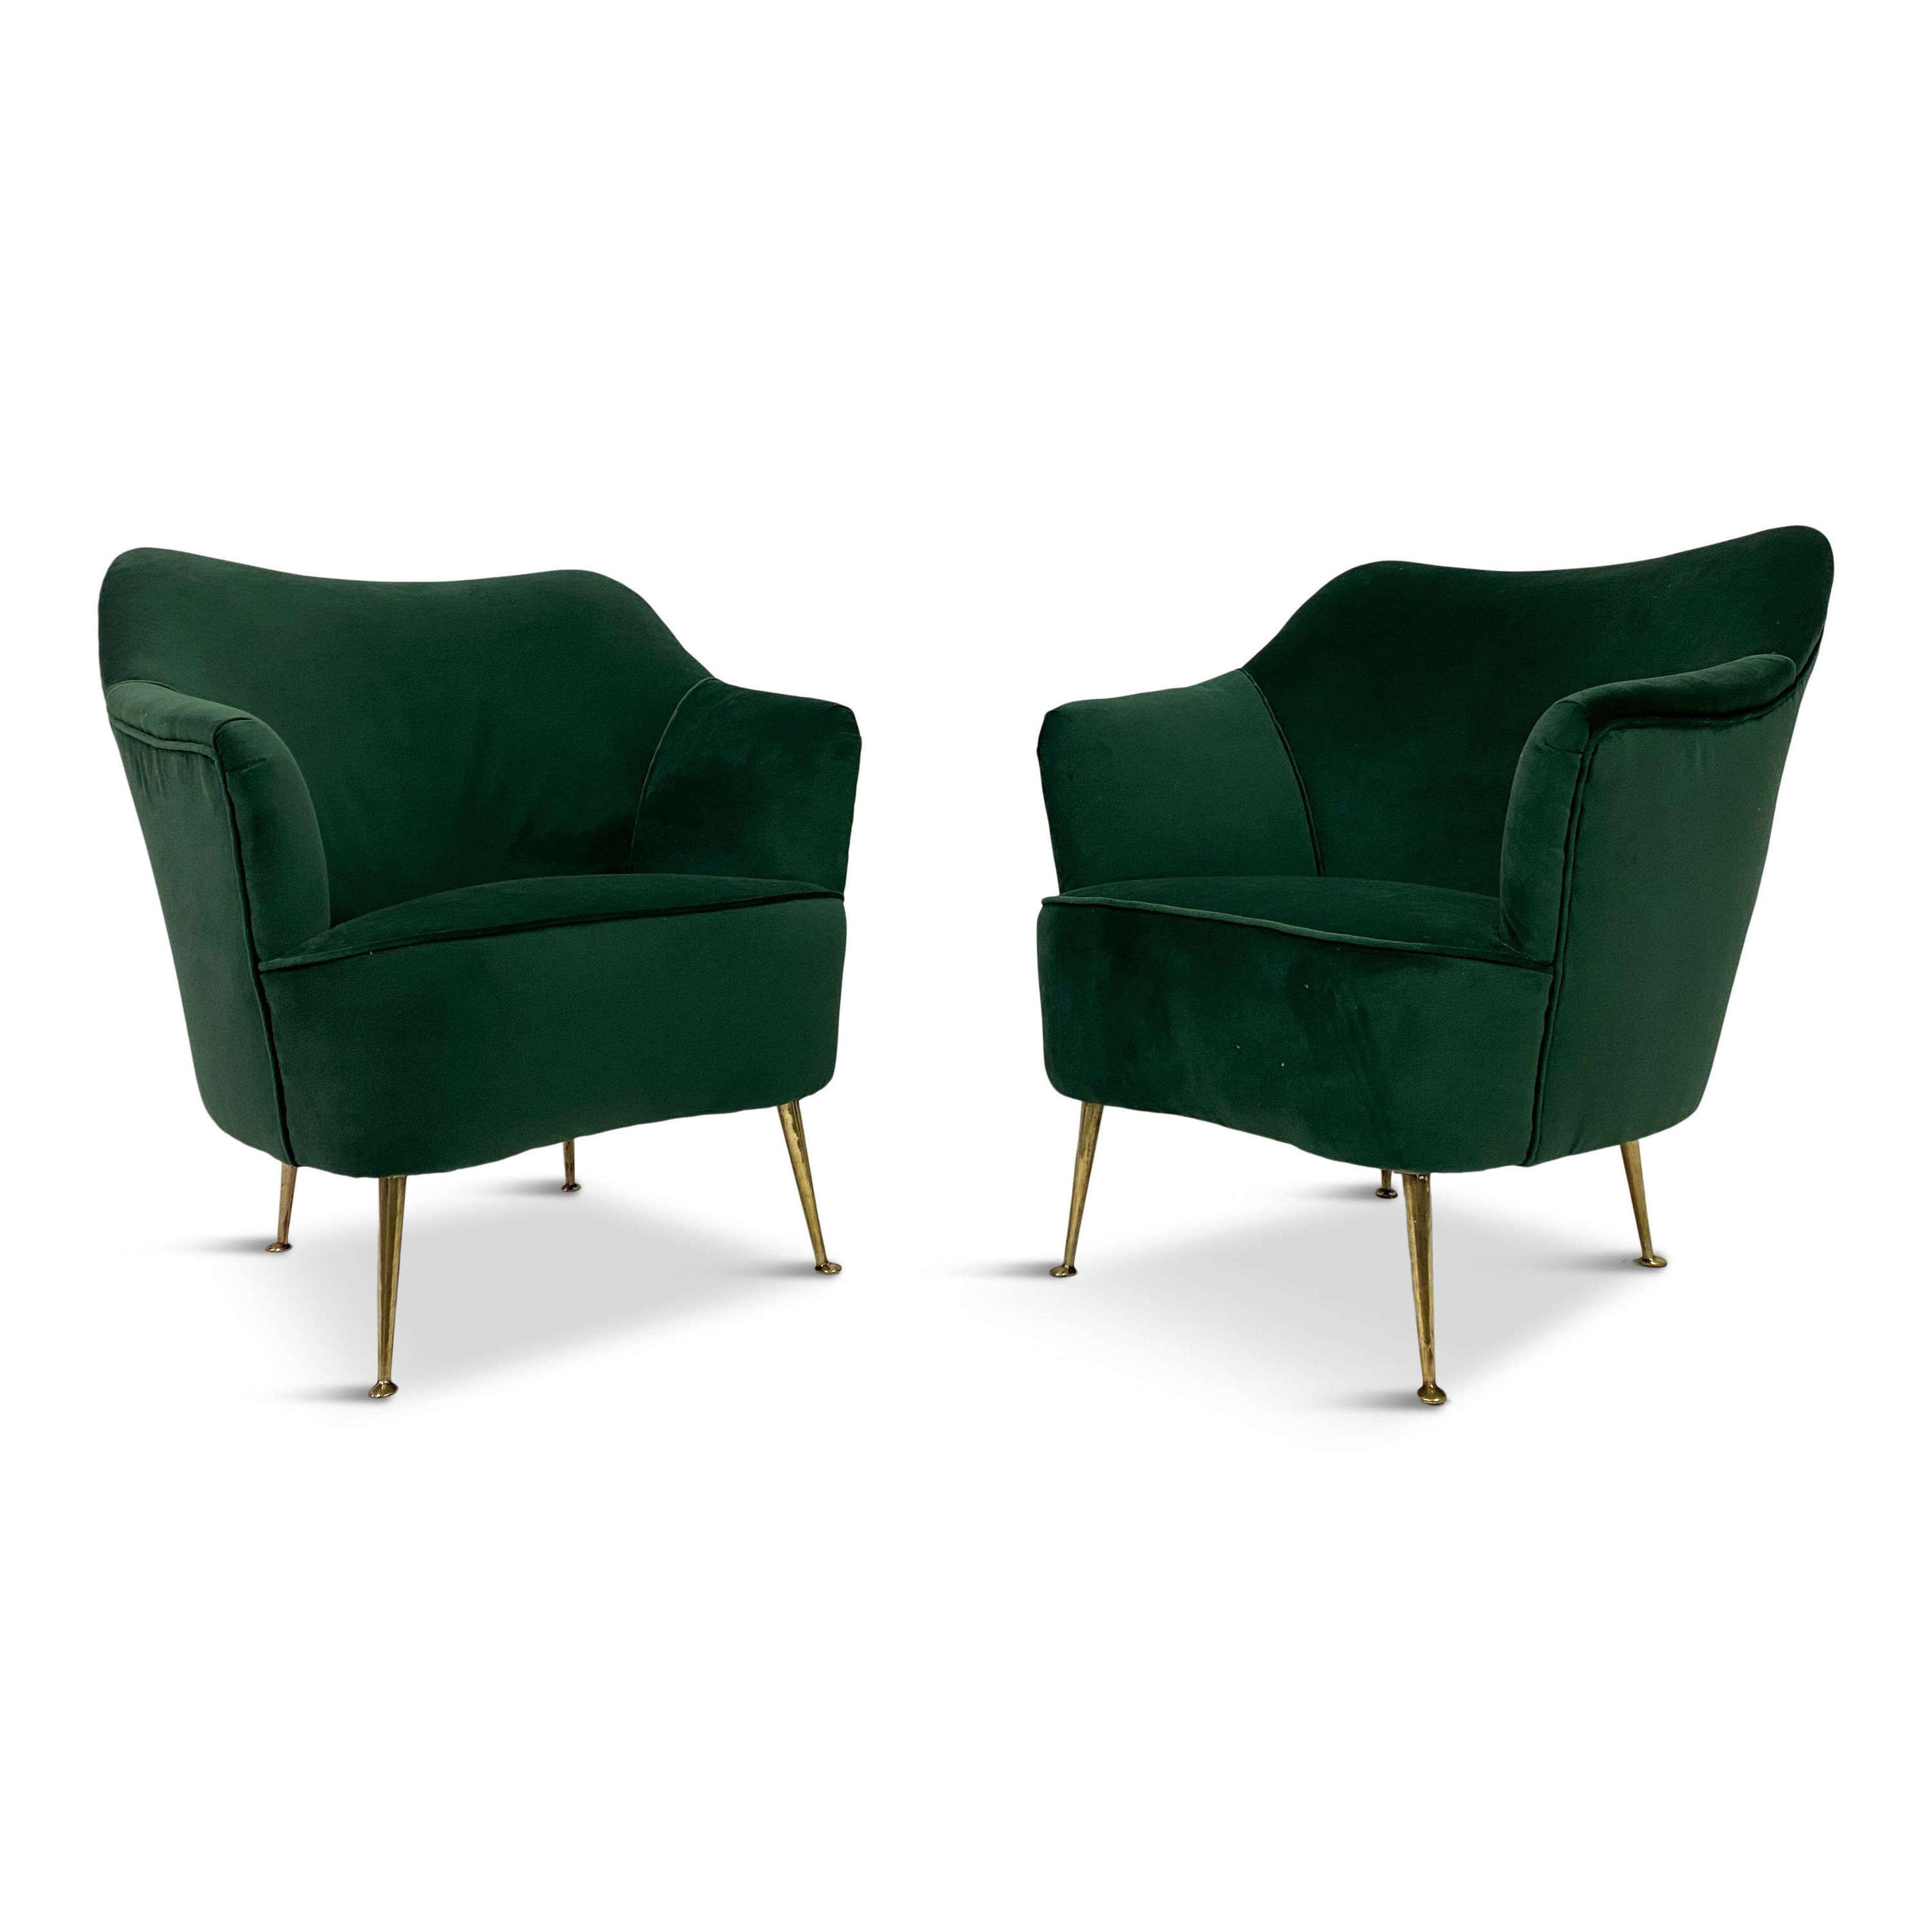 Pair of 1950s Italian Armchairs in Green Velvet